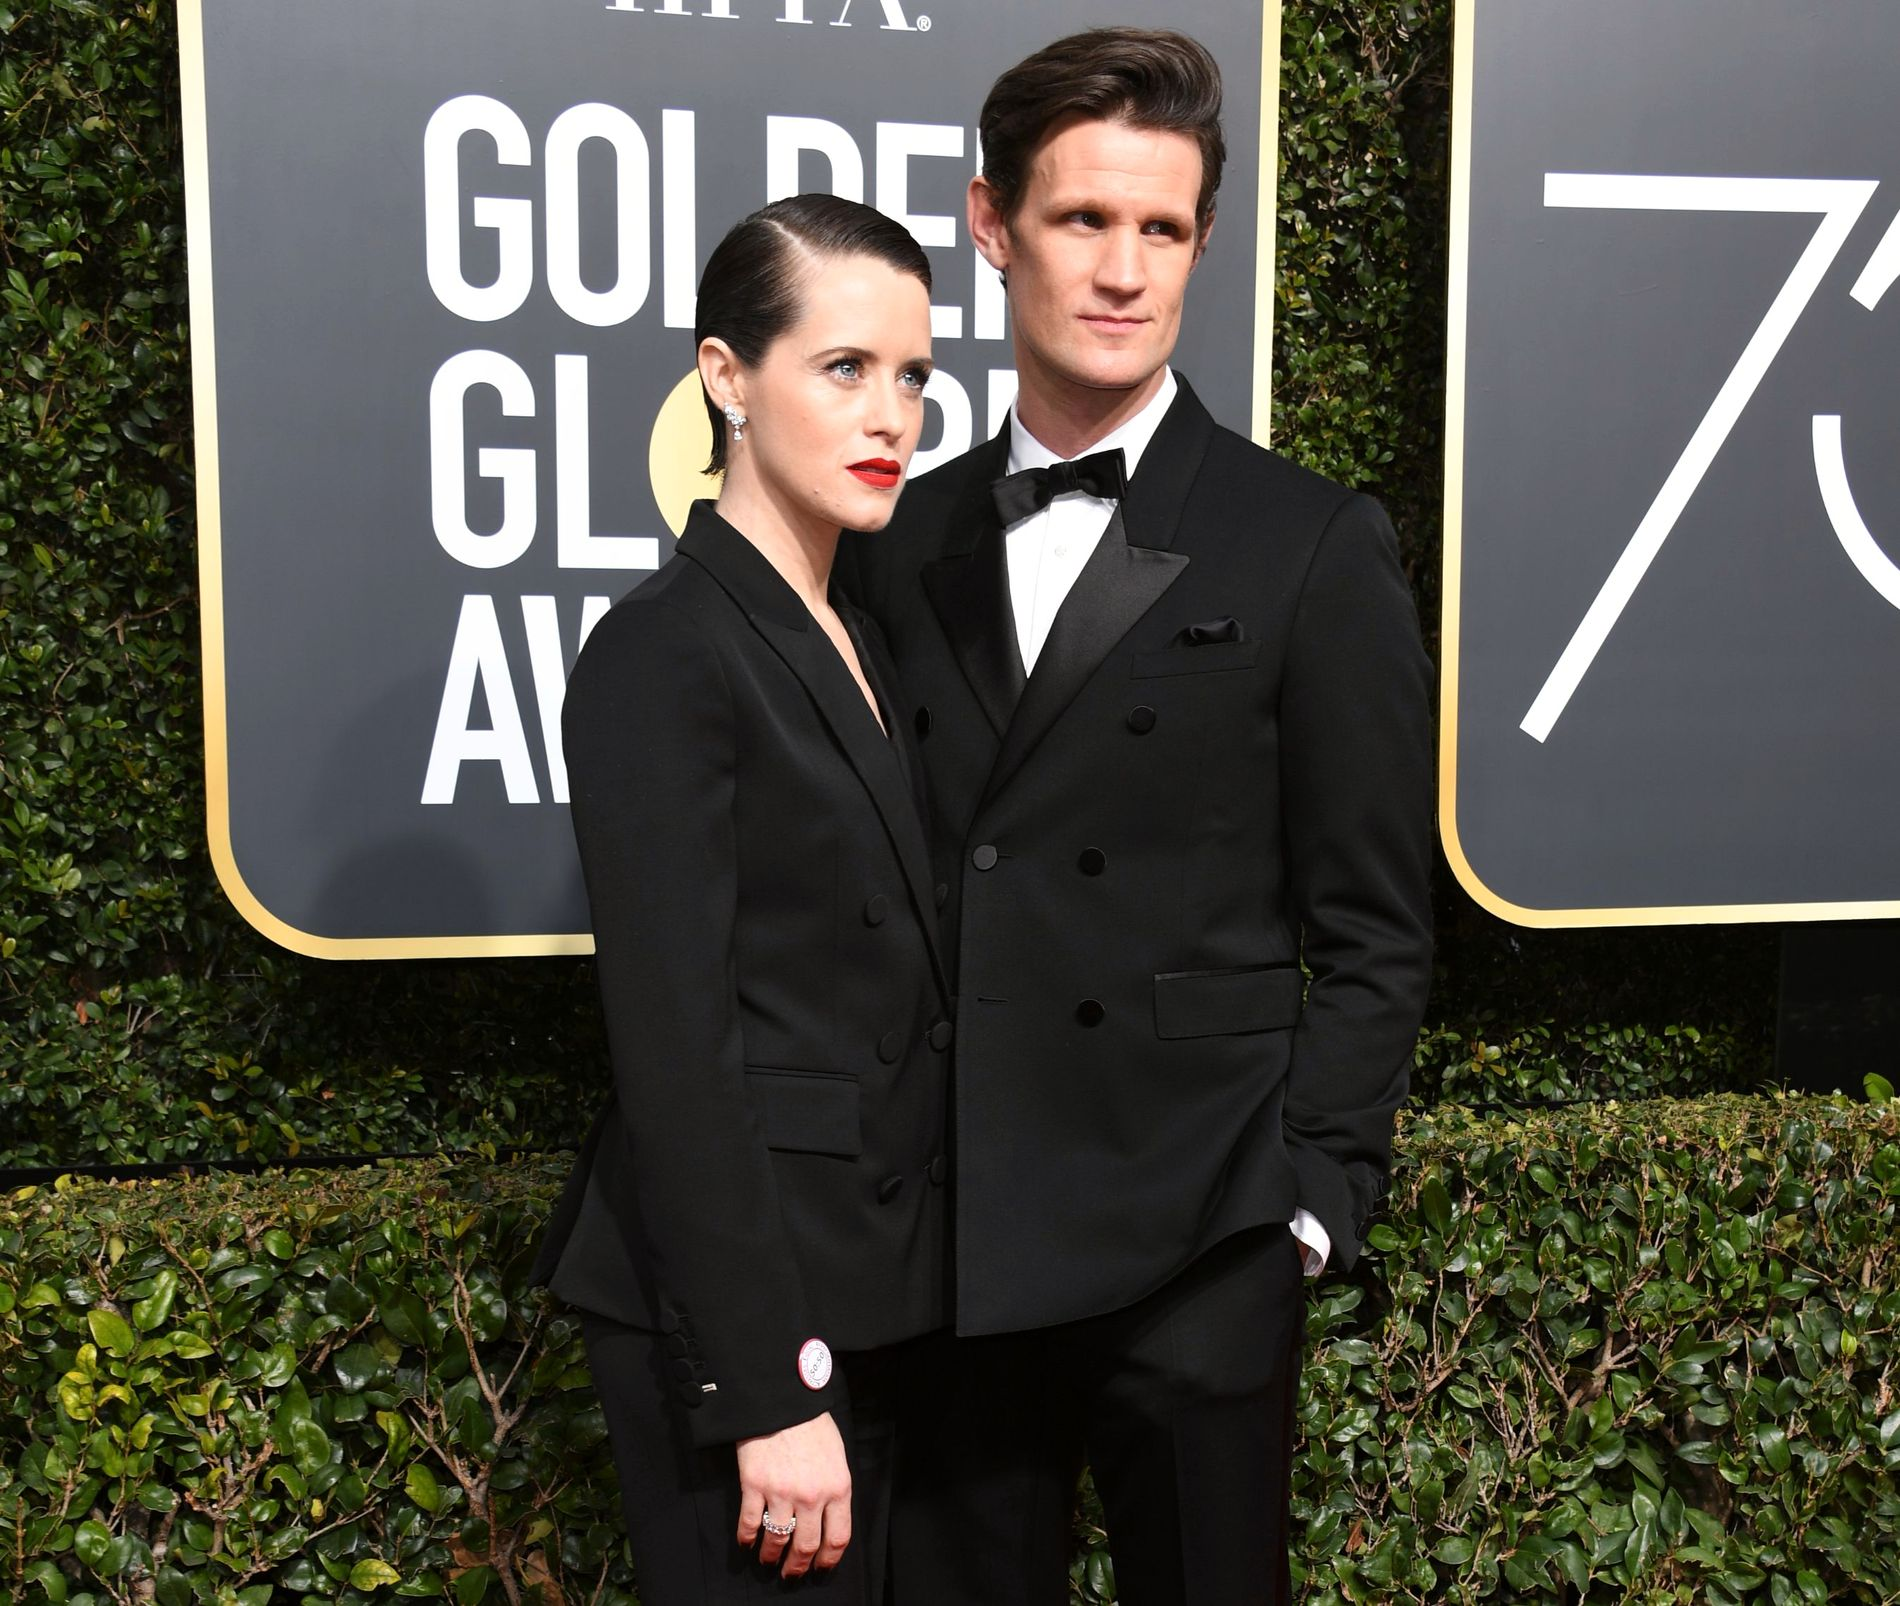 TV-PAR: Claire Foy og Matt Smith på årets Golden Globe Awards i Los Angeles.